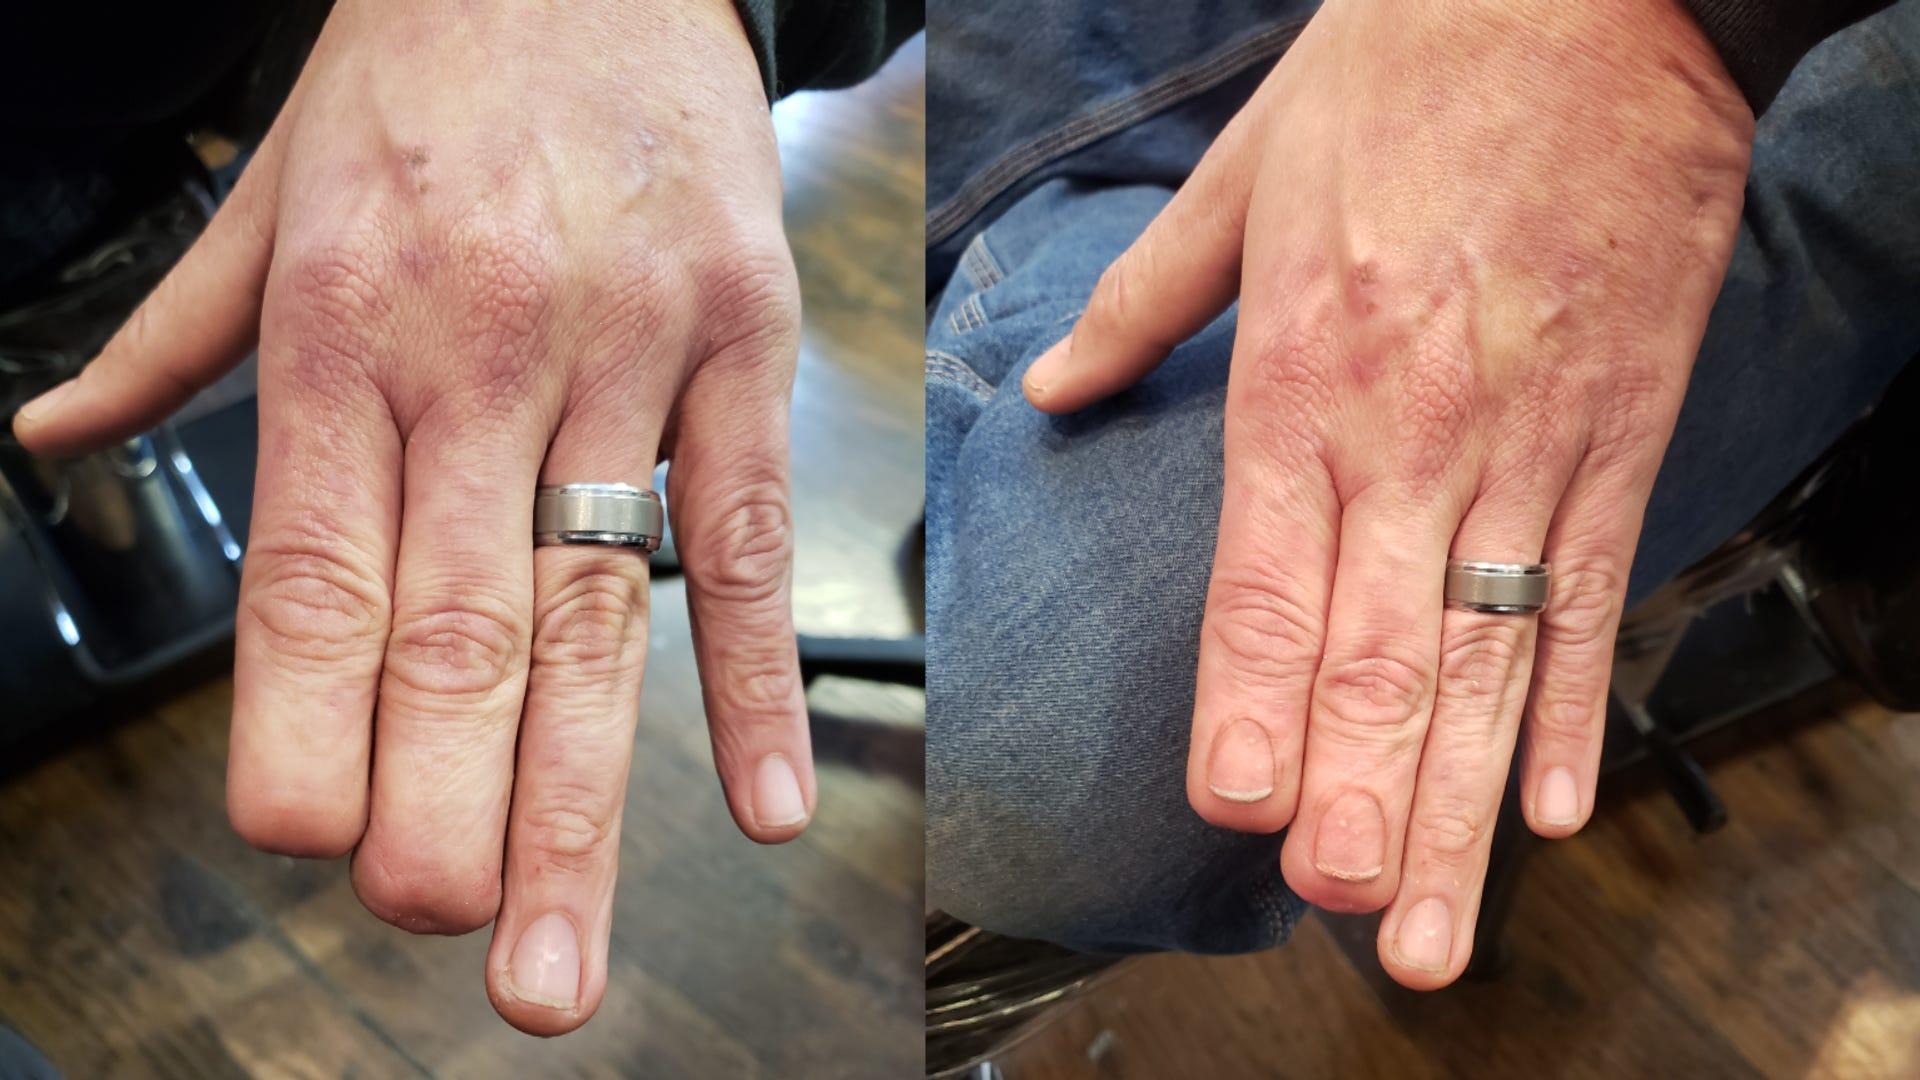 Tattoo Artist Draws Realistic Fingernails For Man With Amputation